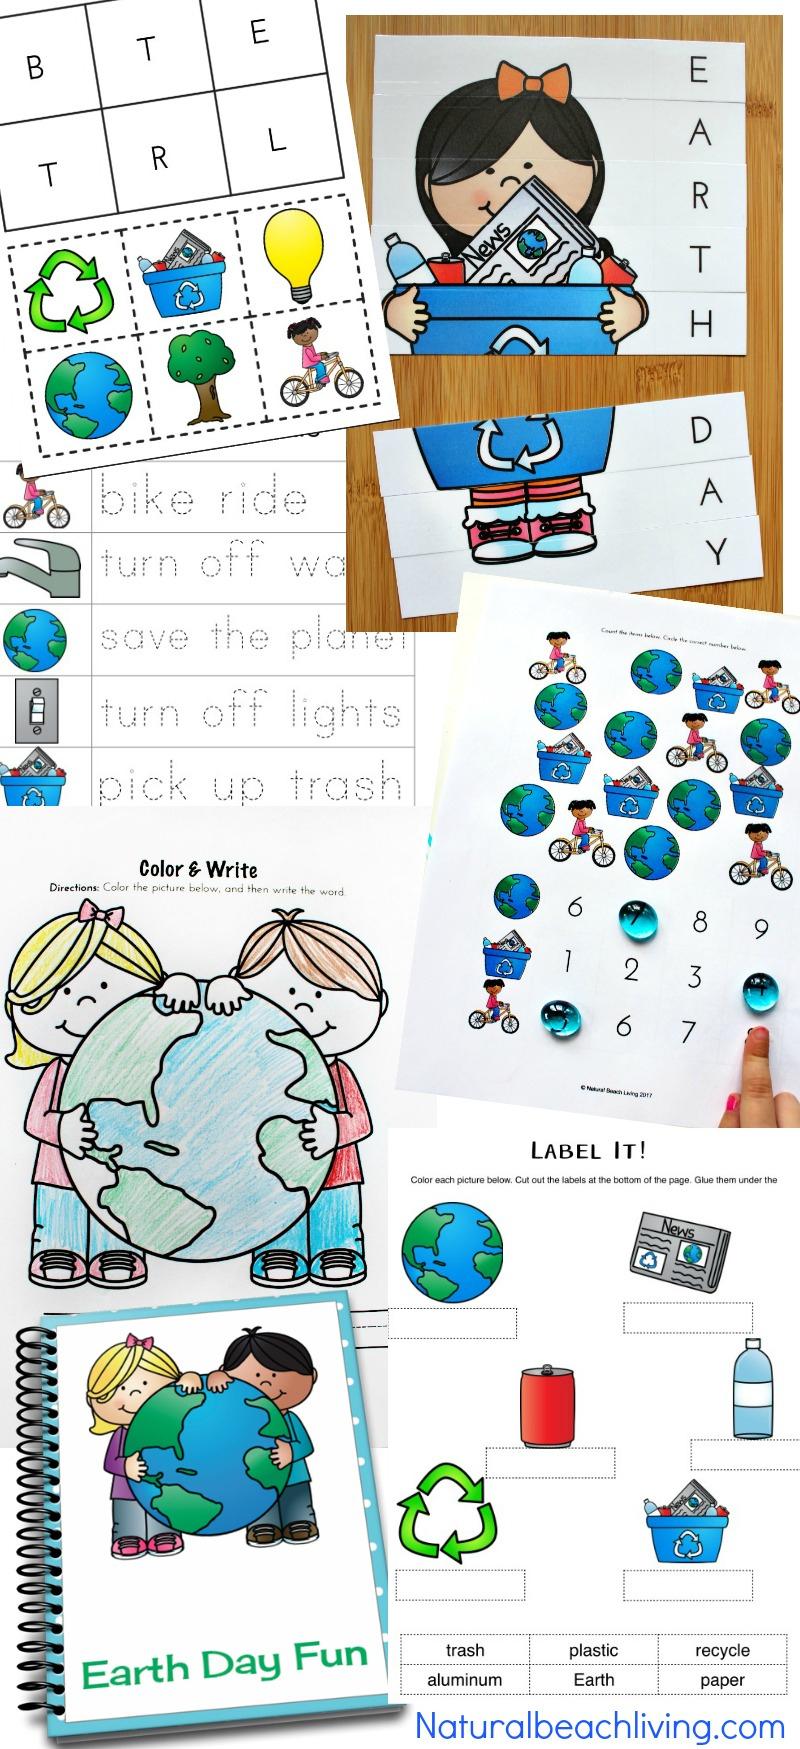 Free Printable Alphabet Puzzles | Free Printables - Printable Alphabet Puzzles